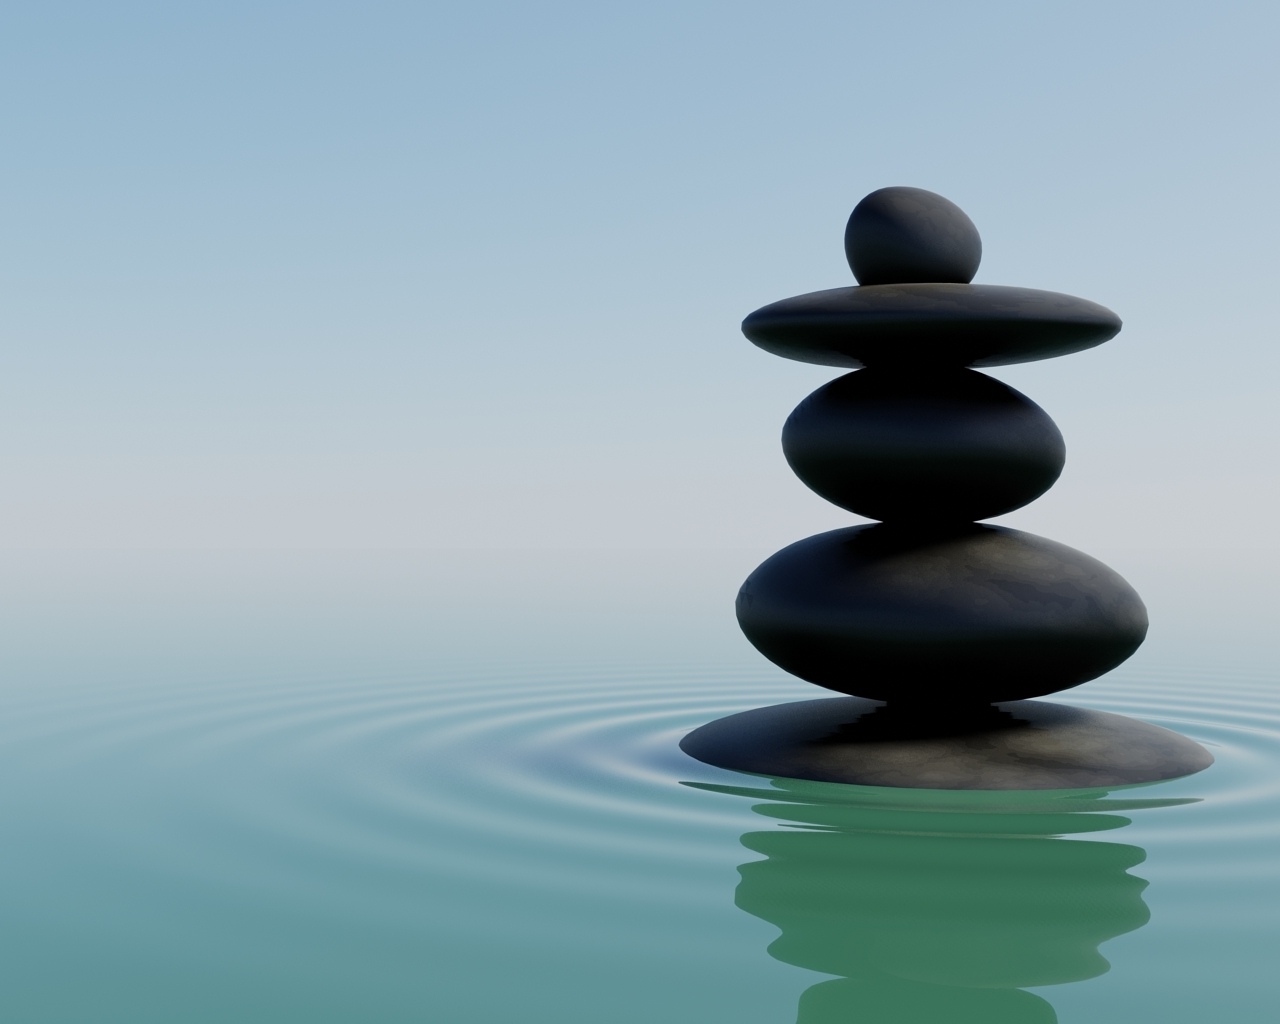 http://2.bp.blogspot.com/-mvaUKSgAbsQ/T2B8UZ0xeVI/AAAAAAAACME/KeW-cElj42Q/s1600/japanese_zen_stones_by_dius19-d3bslwo.jpg